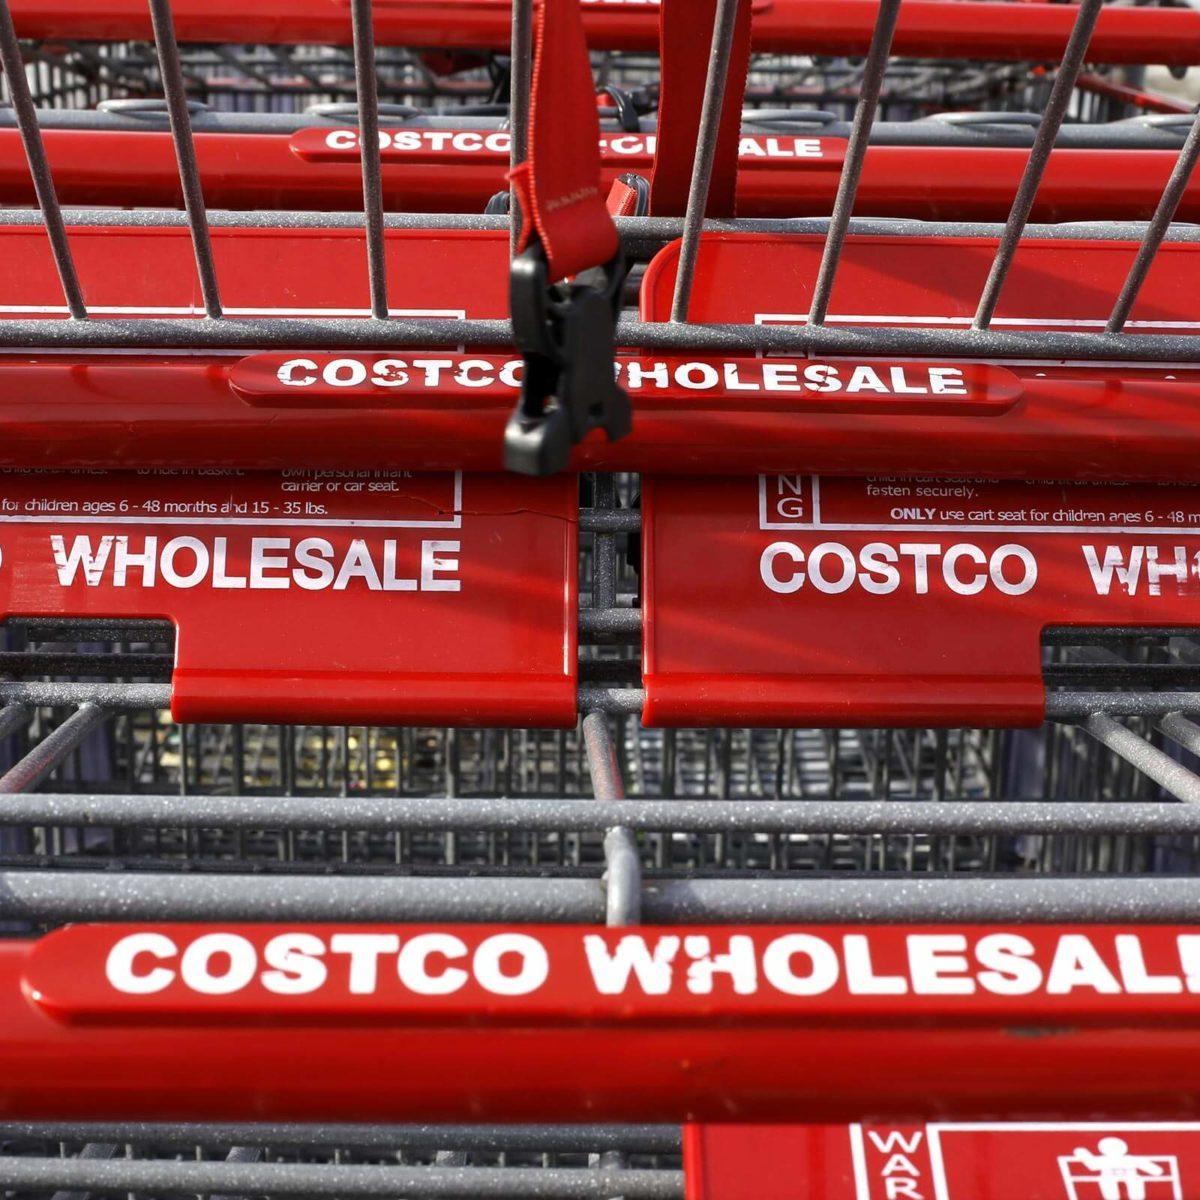 503db7988b8271 Costco Secrets Employees Won't Tell You | Reader's Digest